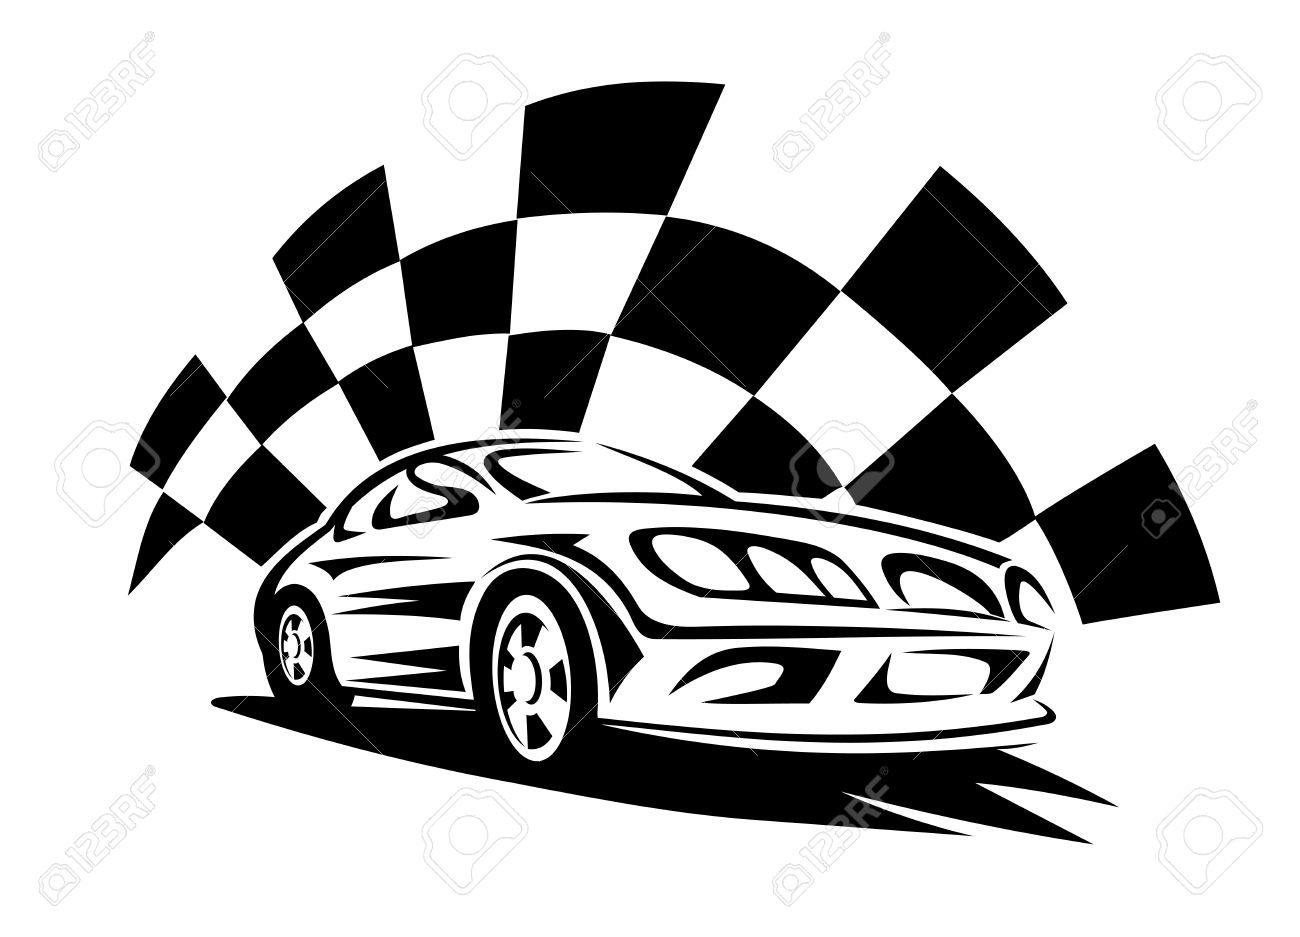 black silhouette of modern racing car with checkered flag on rh 123rf com race car vector art race car vector graphics